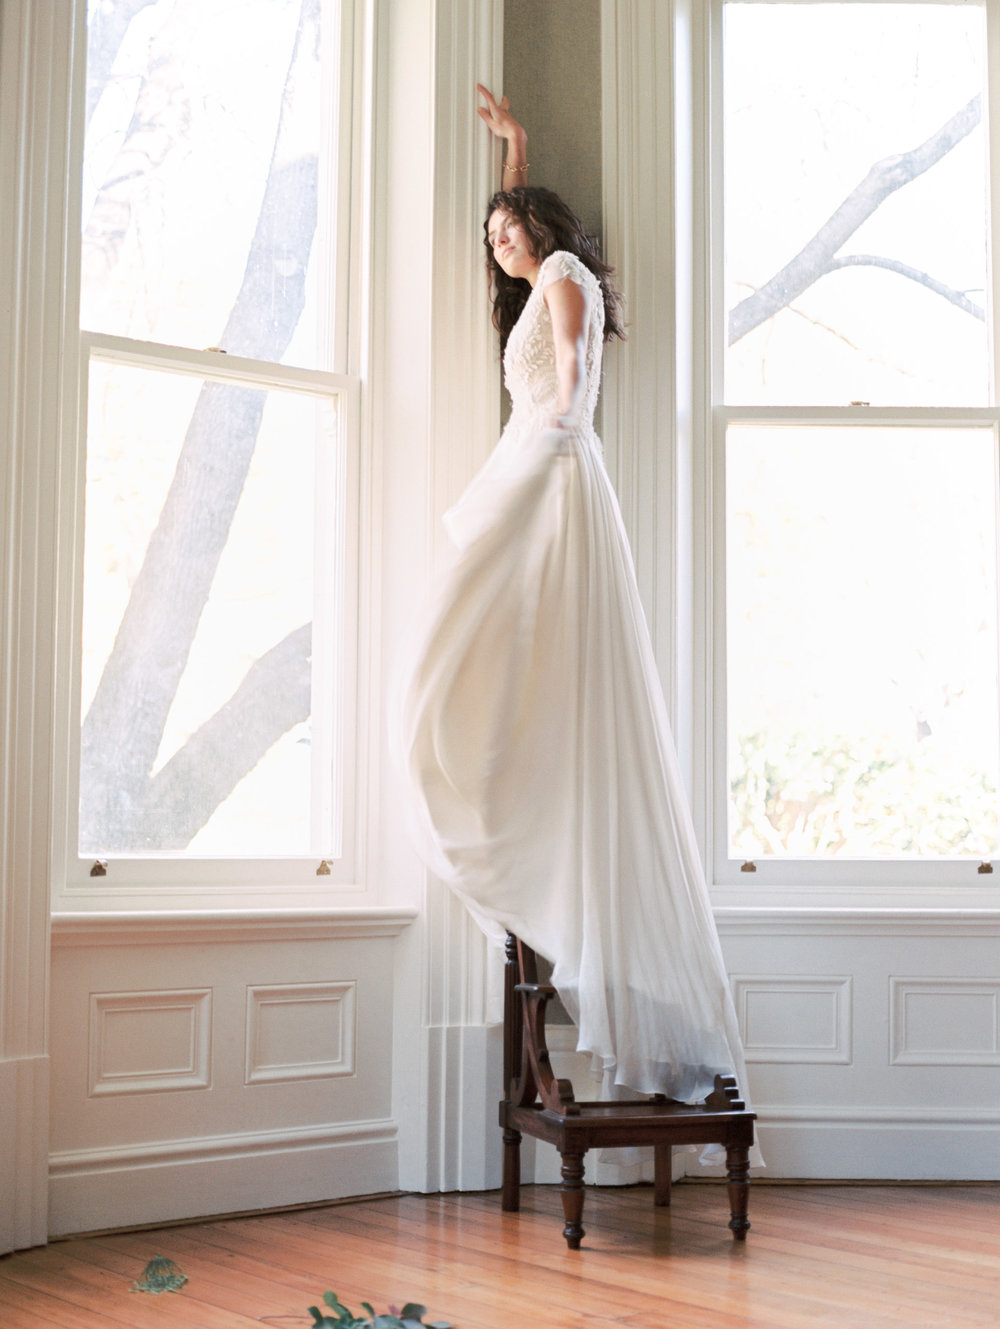 Hopewood House - Romantic Winter Wedding Shoot - Lilli Kad Photography - Shot - Residence Interior 2.jpeg